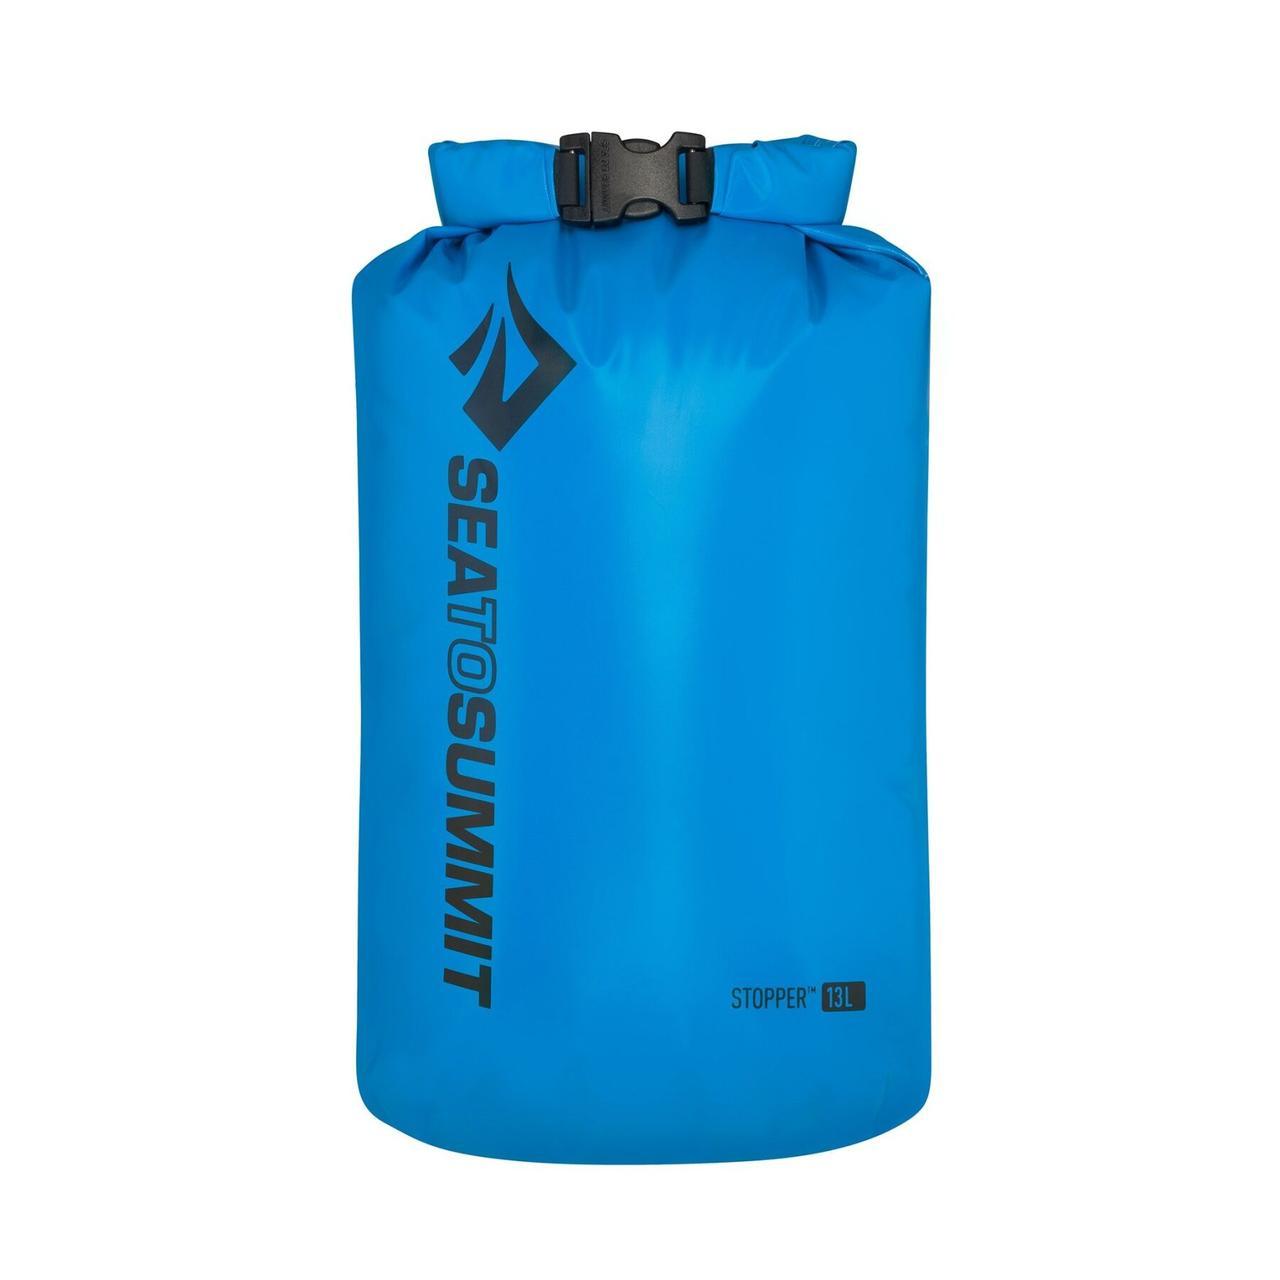 Гермомешок Sea To Summit - Stopper Dry Bag Blue, 13 л (STS ASDB13BL)(Объем 8 л)